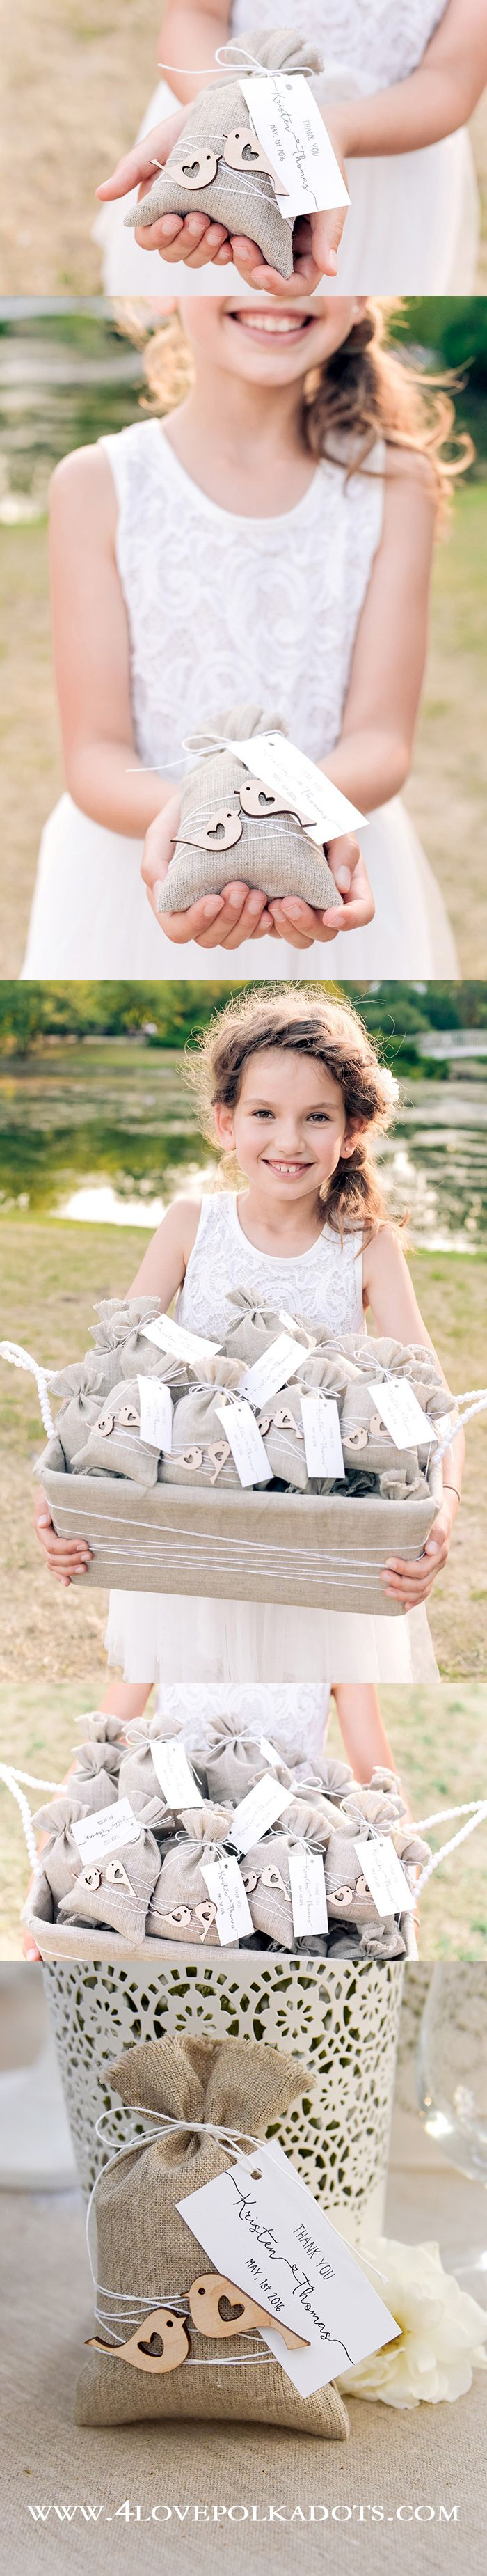 Linen Rustic LoveBirds Favor Bags - Impress Your Guests ! #weddingideas